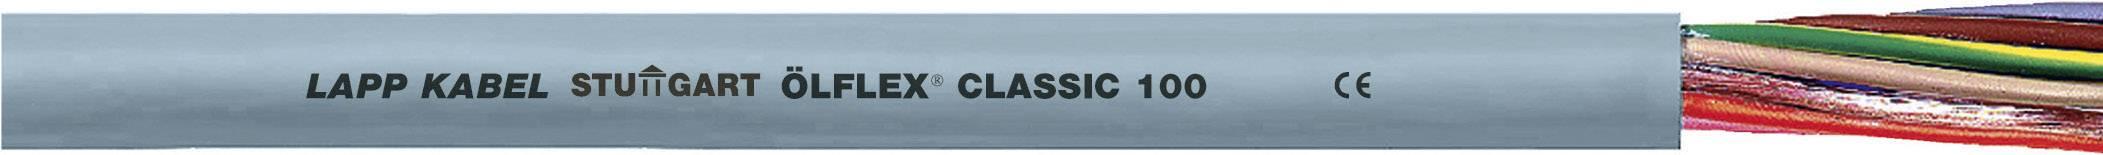 Kabel LappKabel Ölflex CLASSIC 100 3G0,5 (00100014), PVC, 5,1 mm, 750 V, šedá, 1000 m